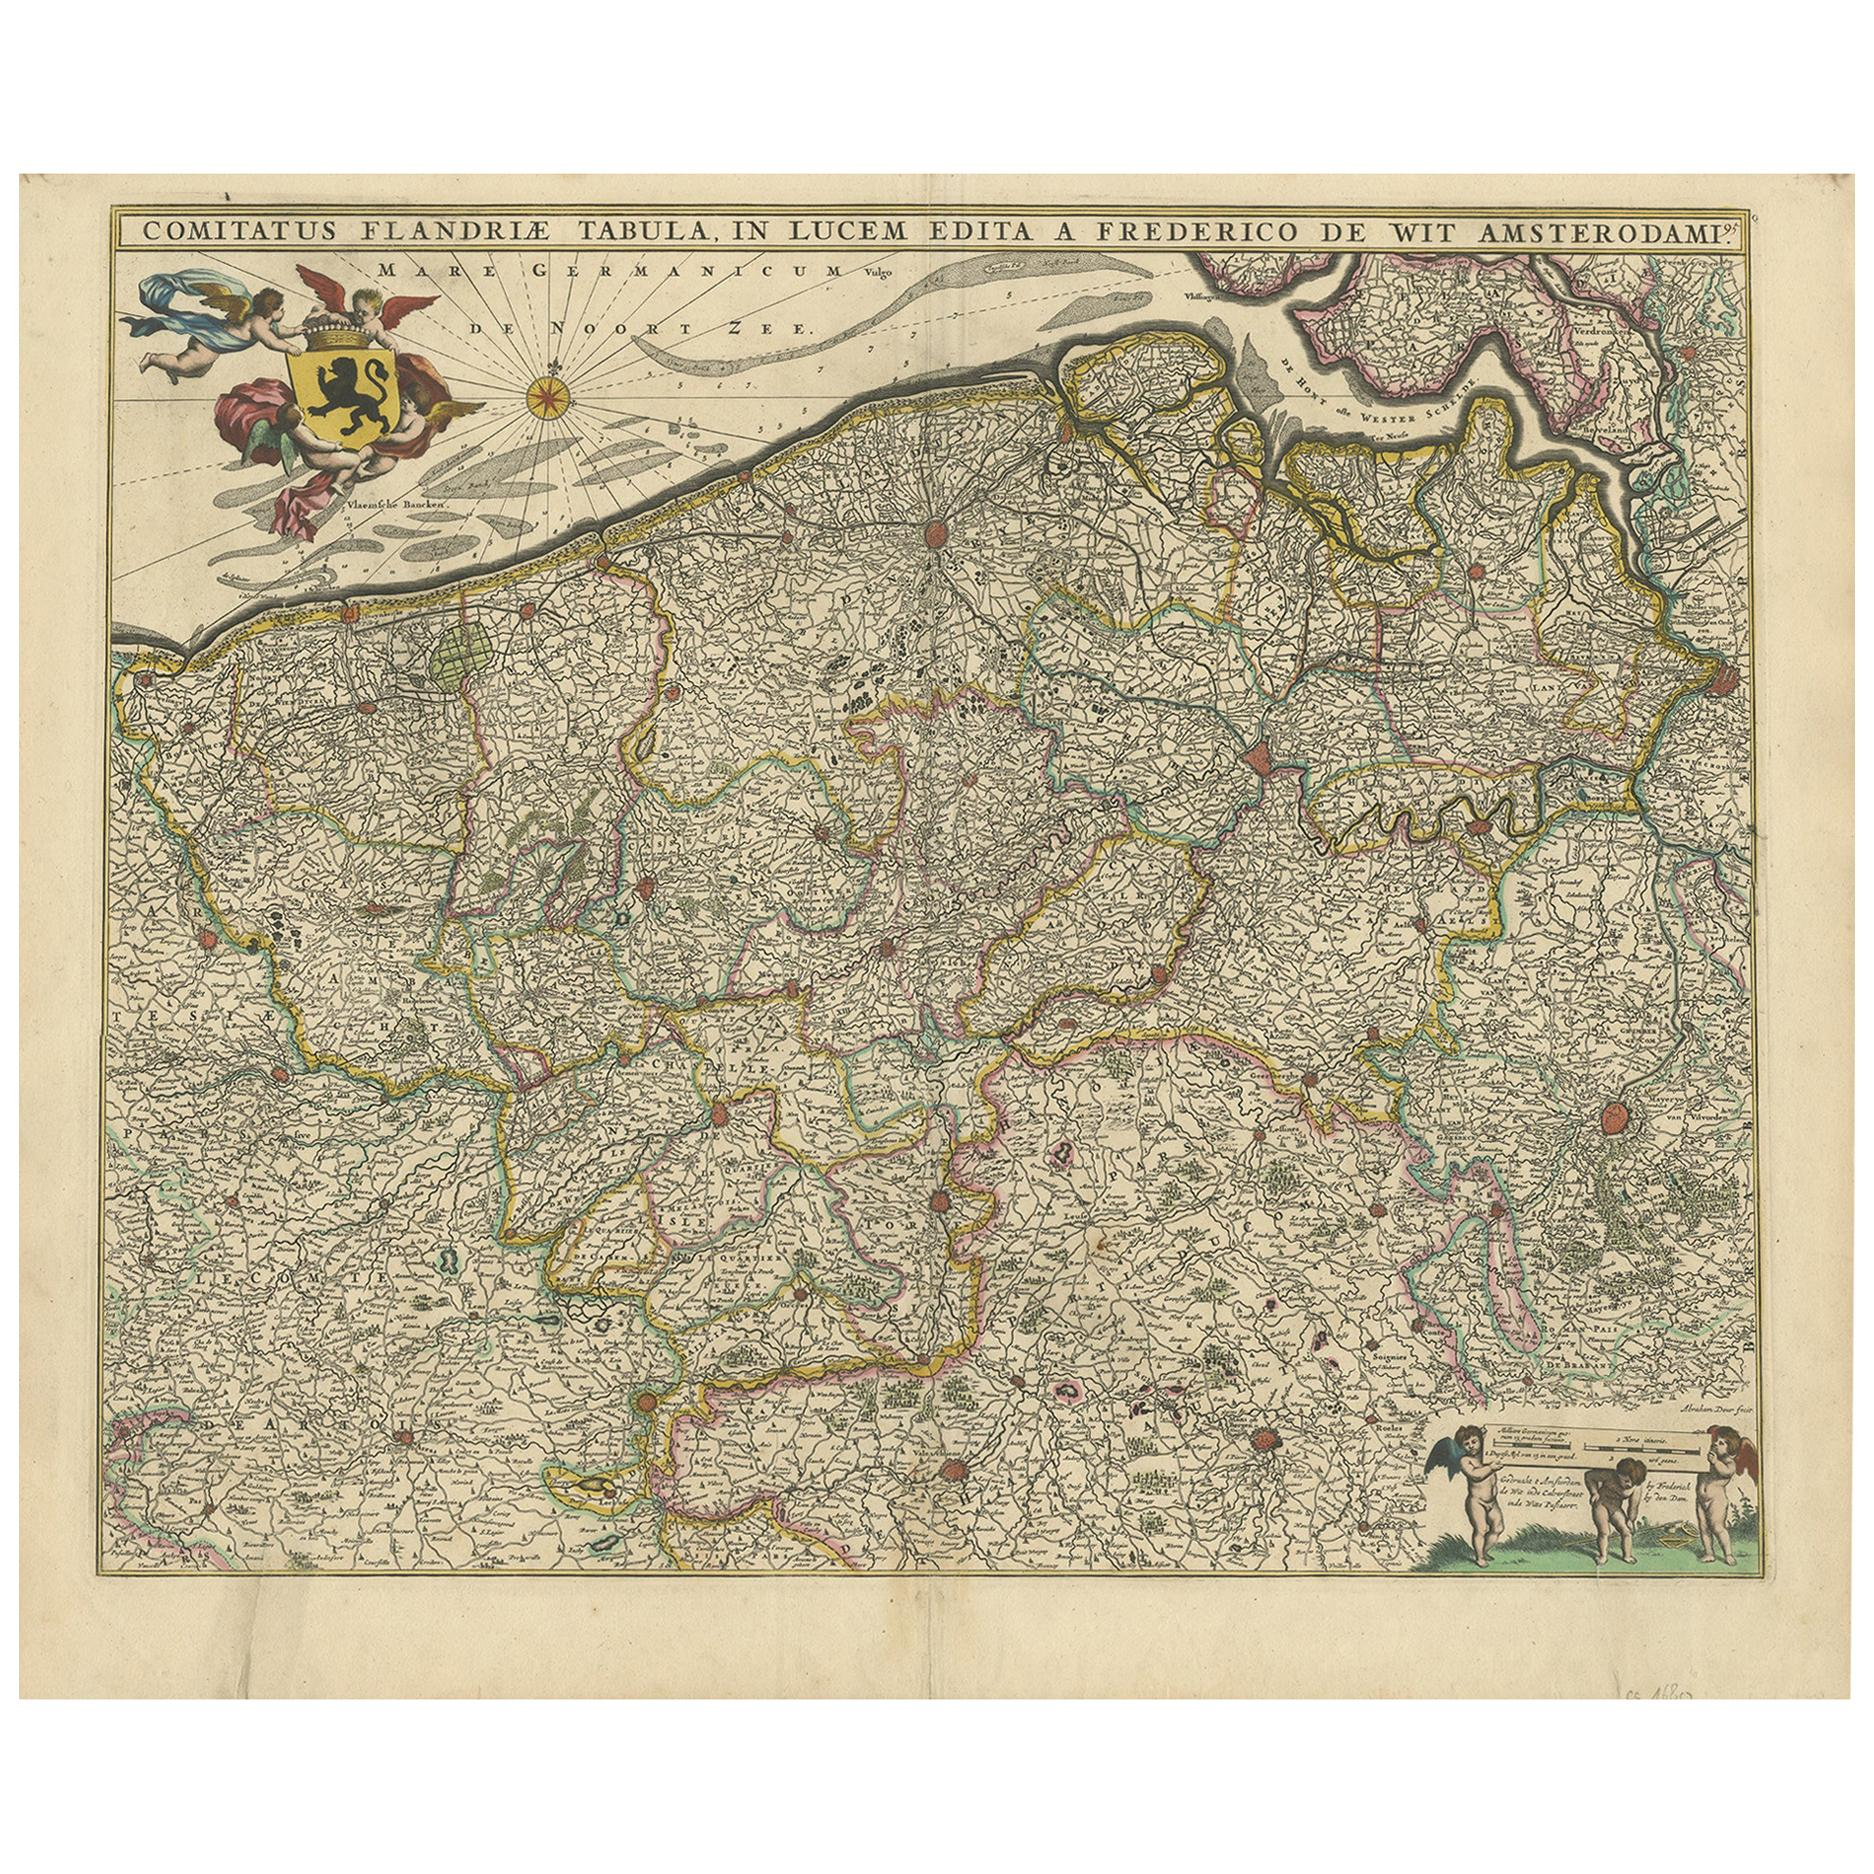 Antique Map of Flanders 'Belgium' by F. de Wit, circa 1680